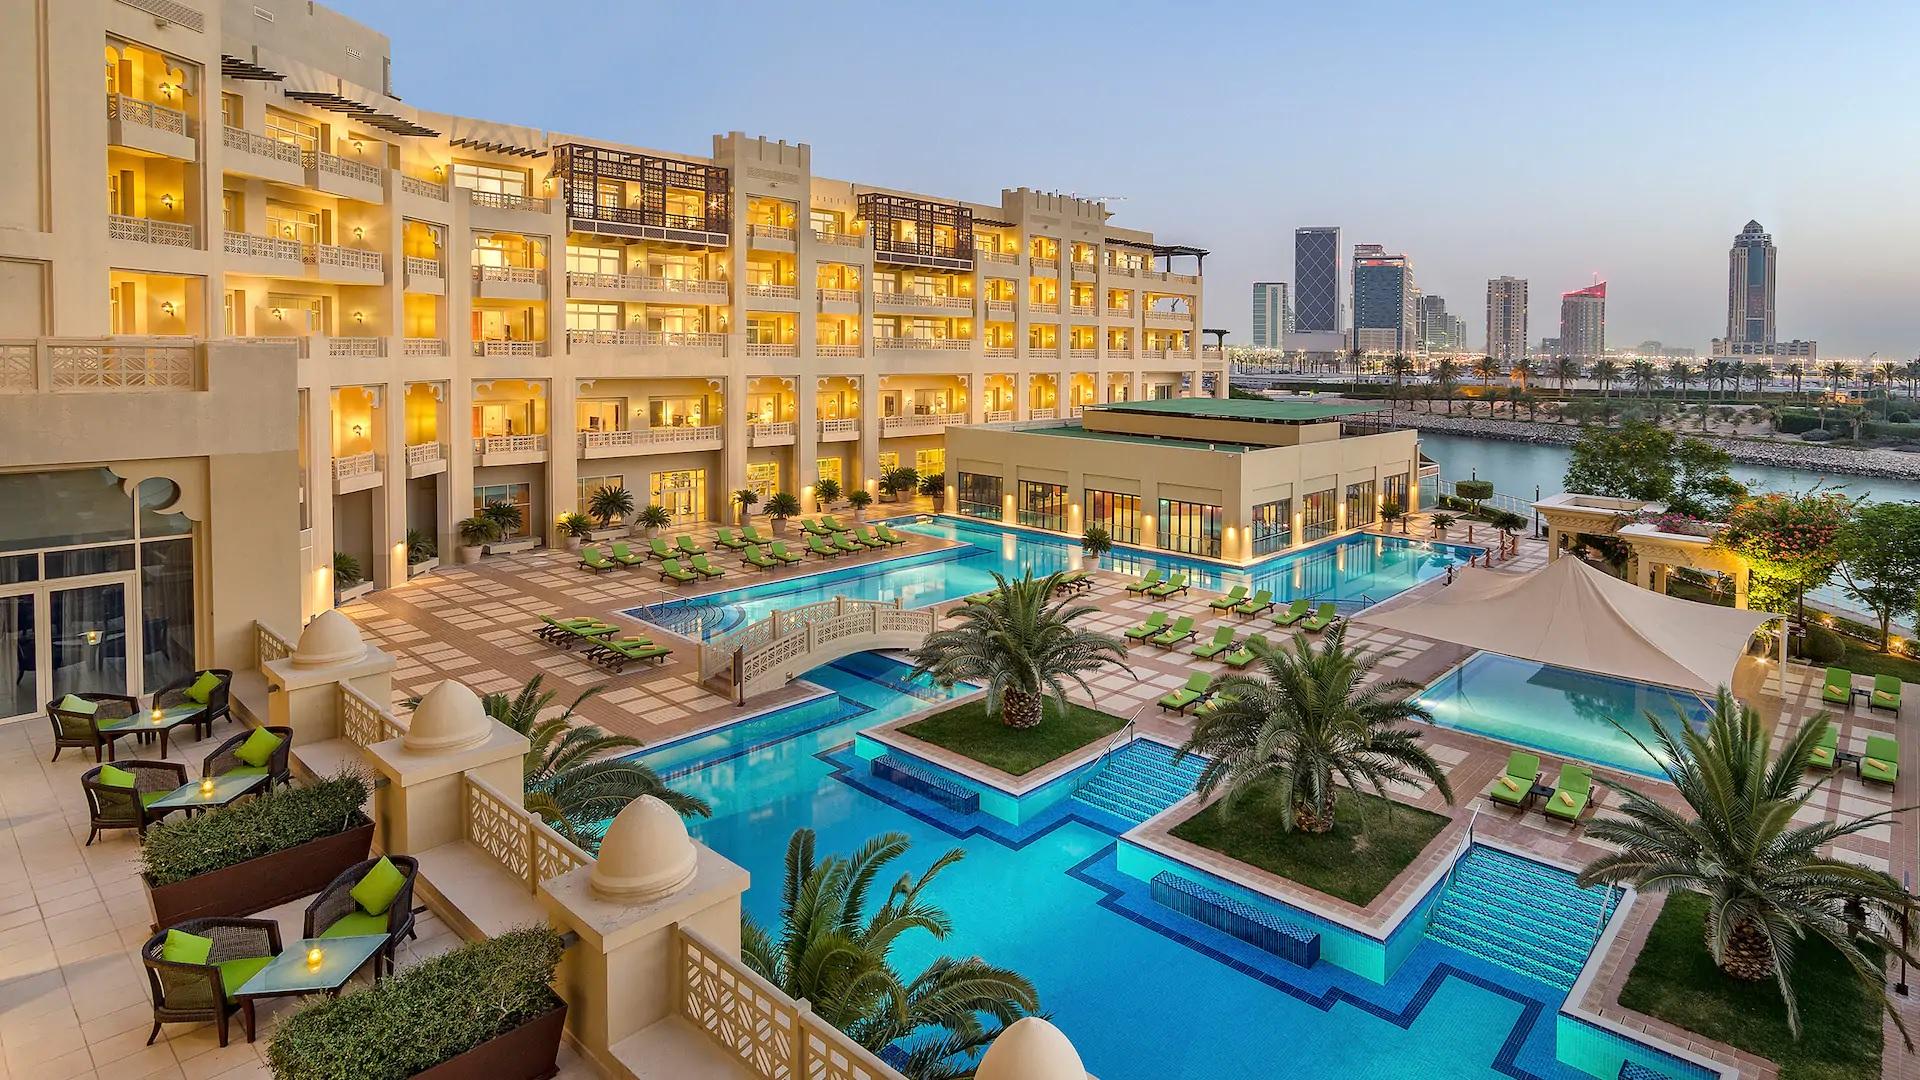 Grand Hyatt resort & spa